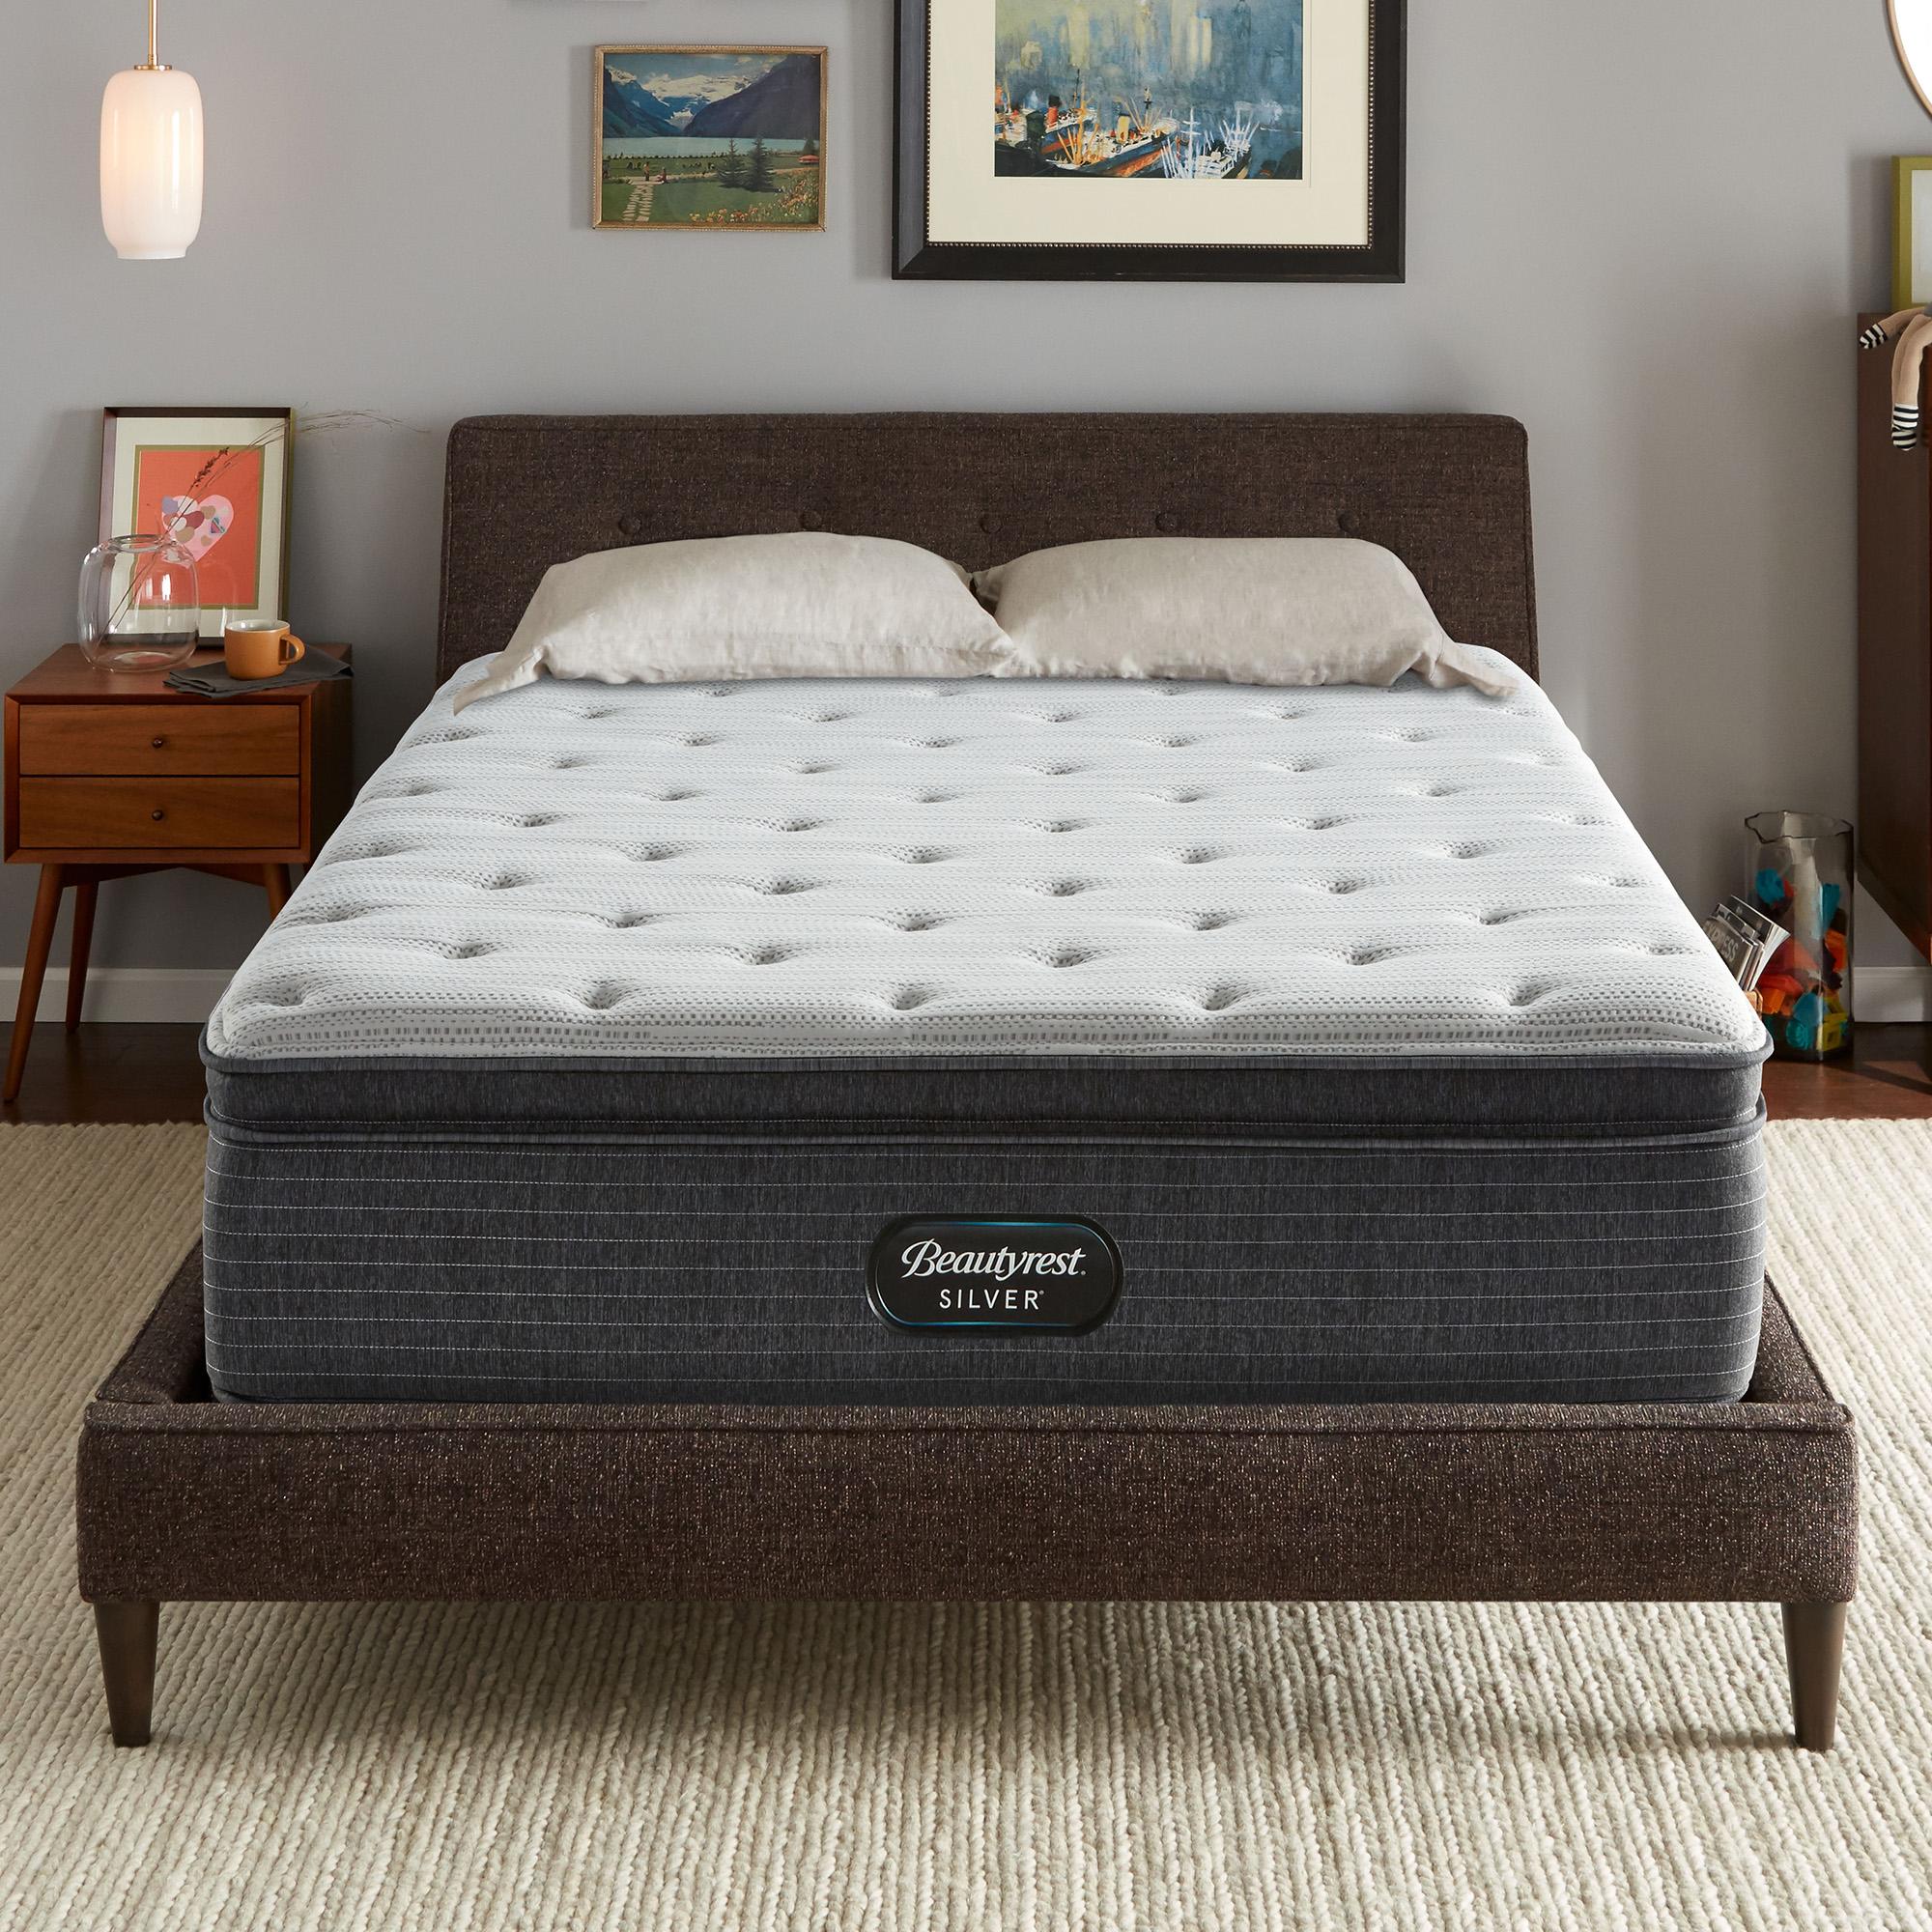 walmart mattress shopping pros